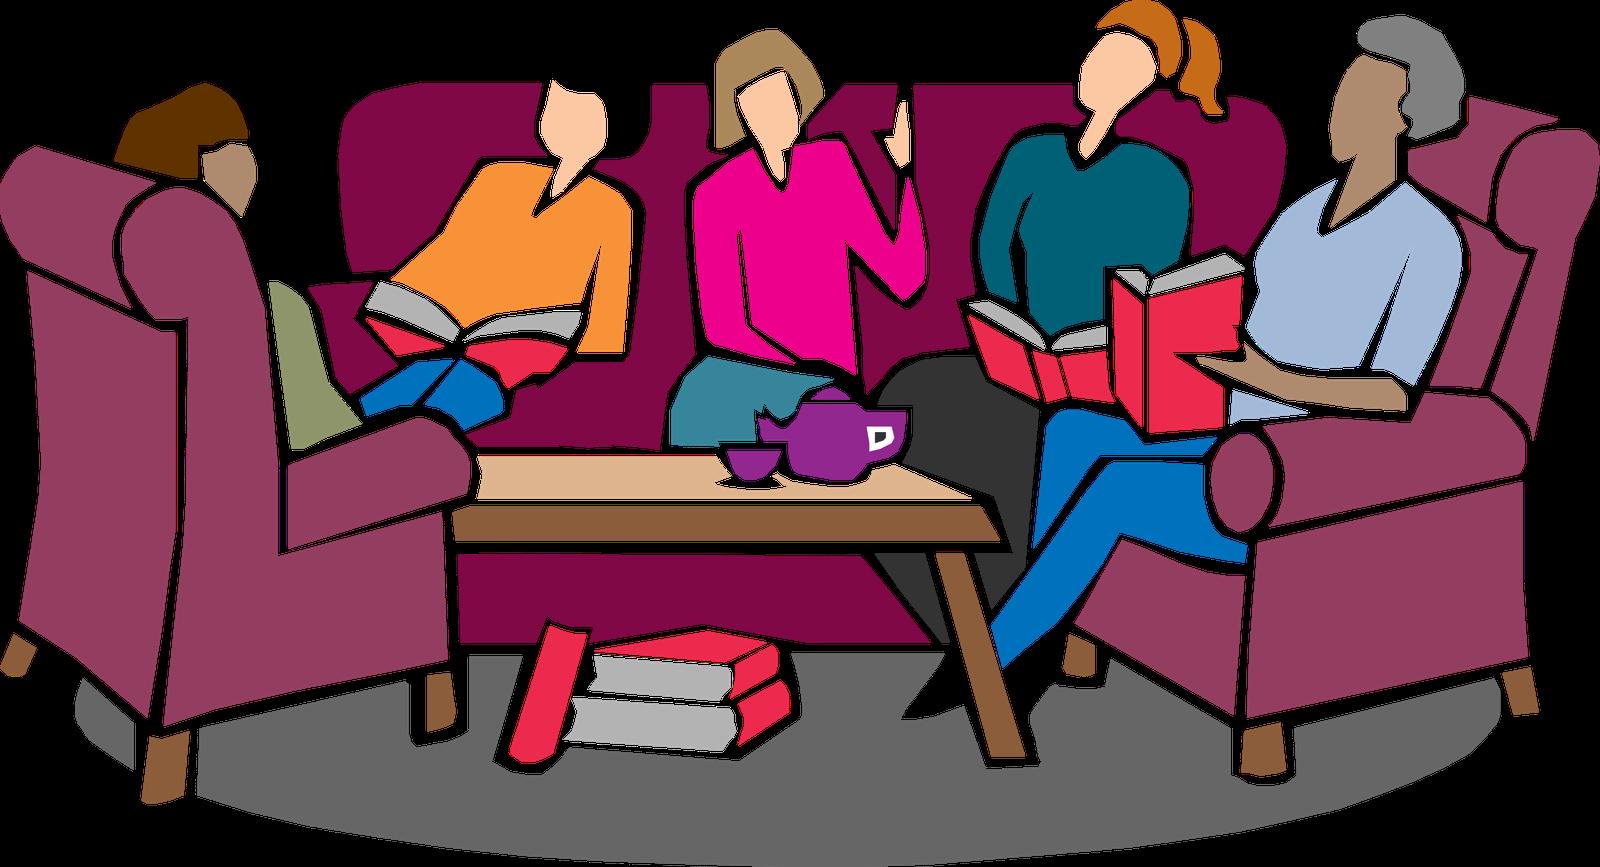 Club clipart Club Community — Library Branch